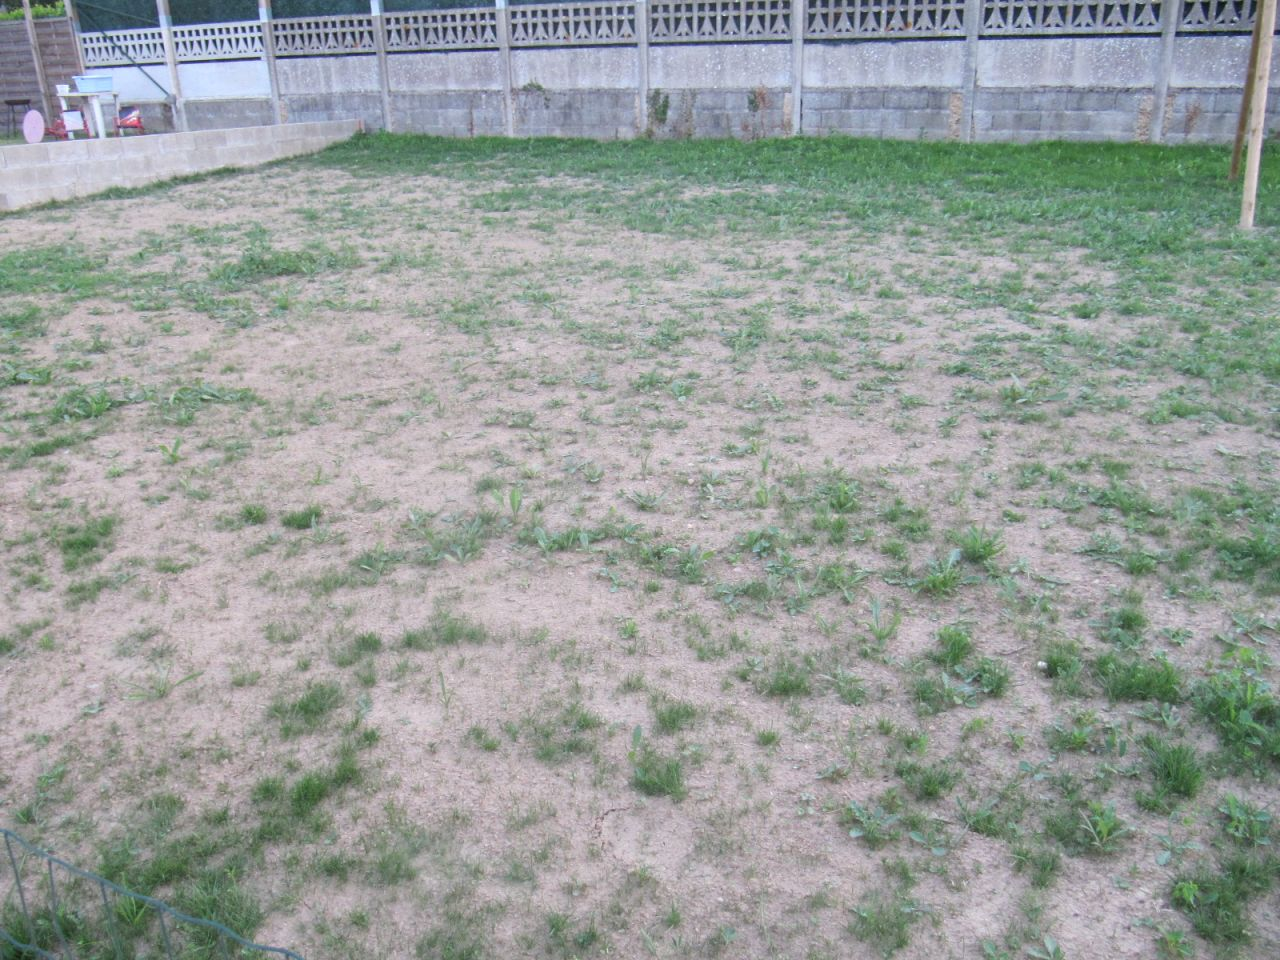 pelouse 1 mois après